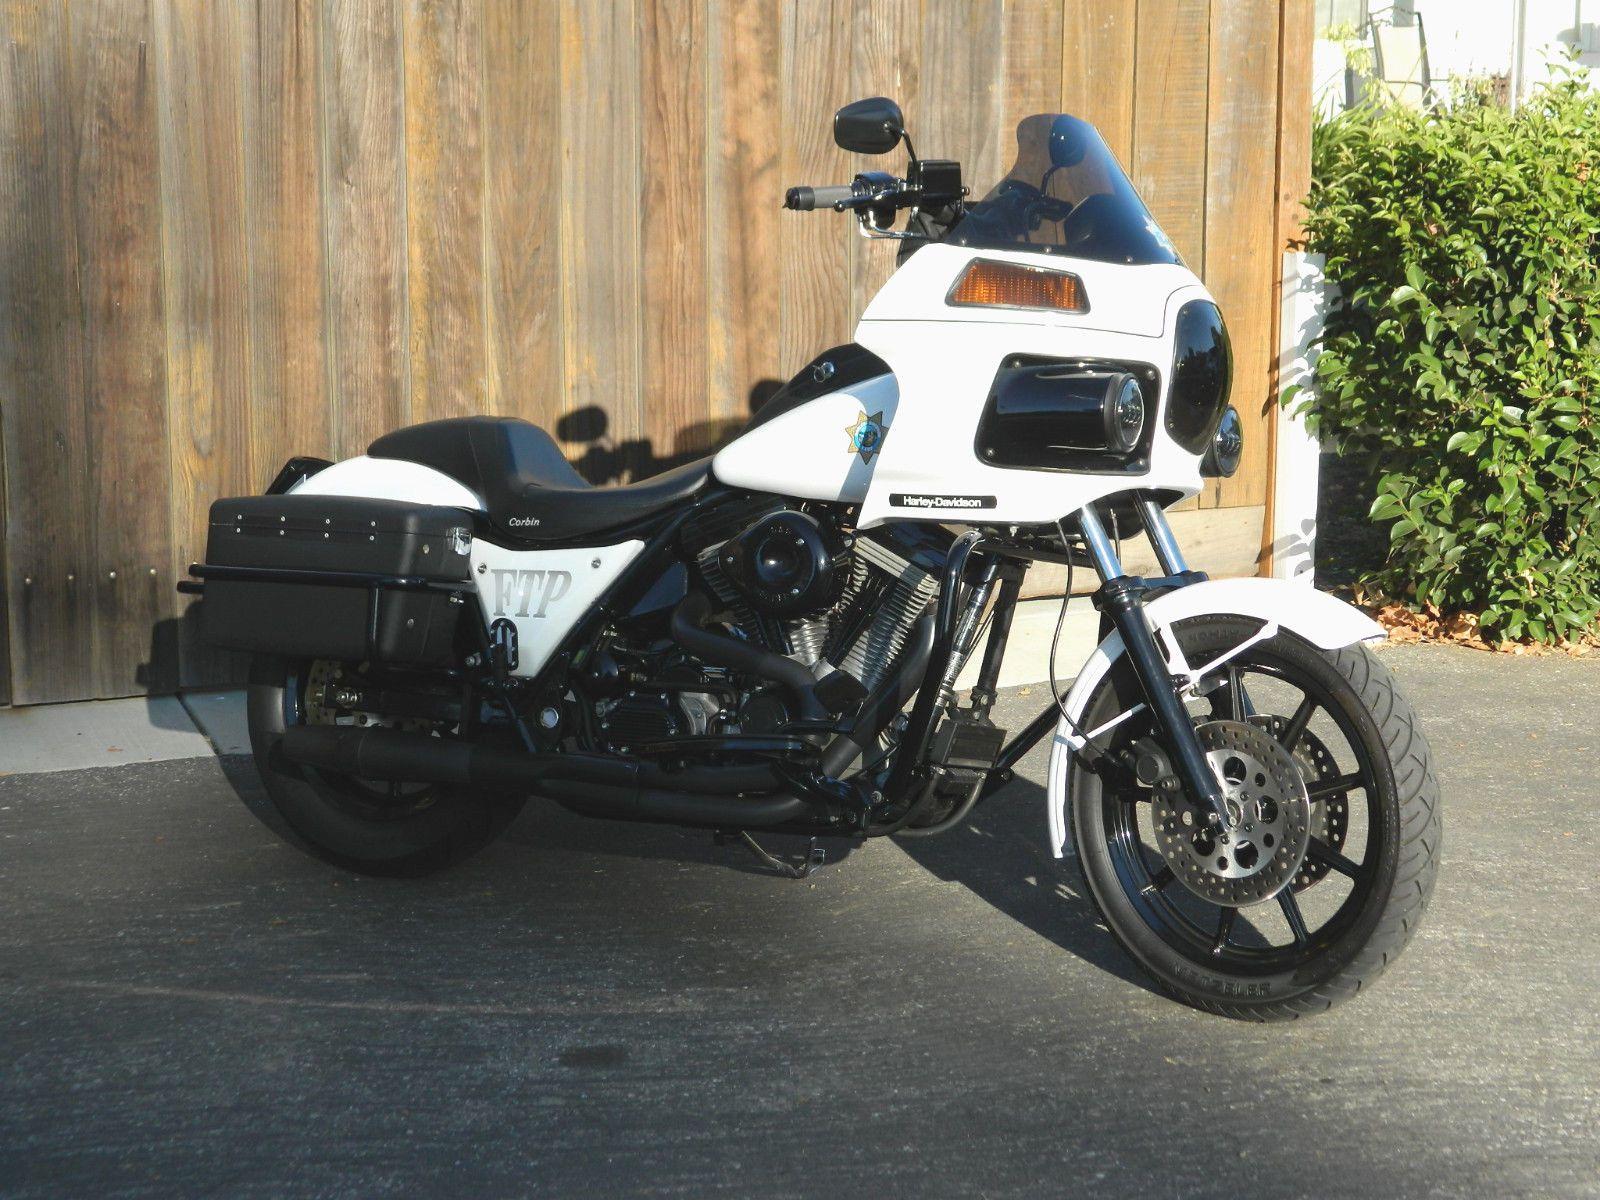 Ebay 1988 Harley Davidson Fxr Harley Davidson Police Fxrp Harleydavidson Harley Davidson Harley Touring Bike